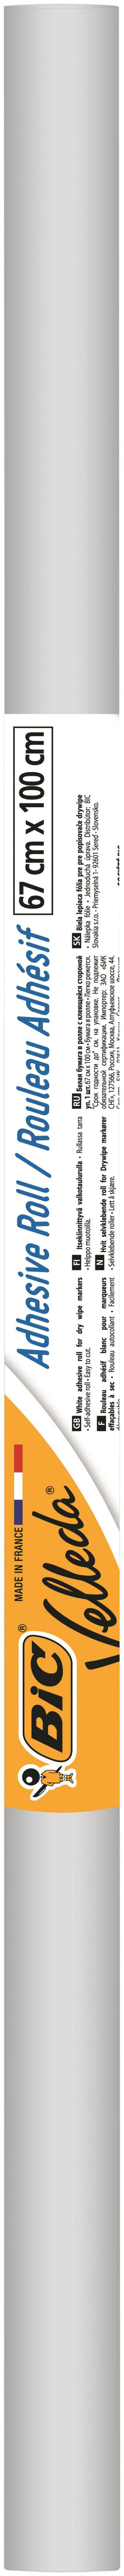 Bic Velleda Adhesive Whiteboard Roll 670x1000mm 870493